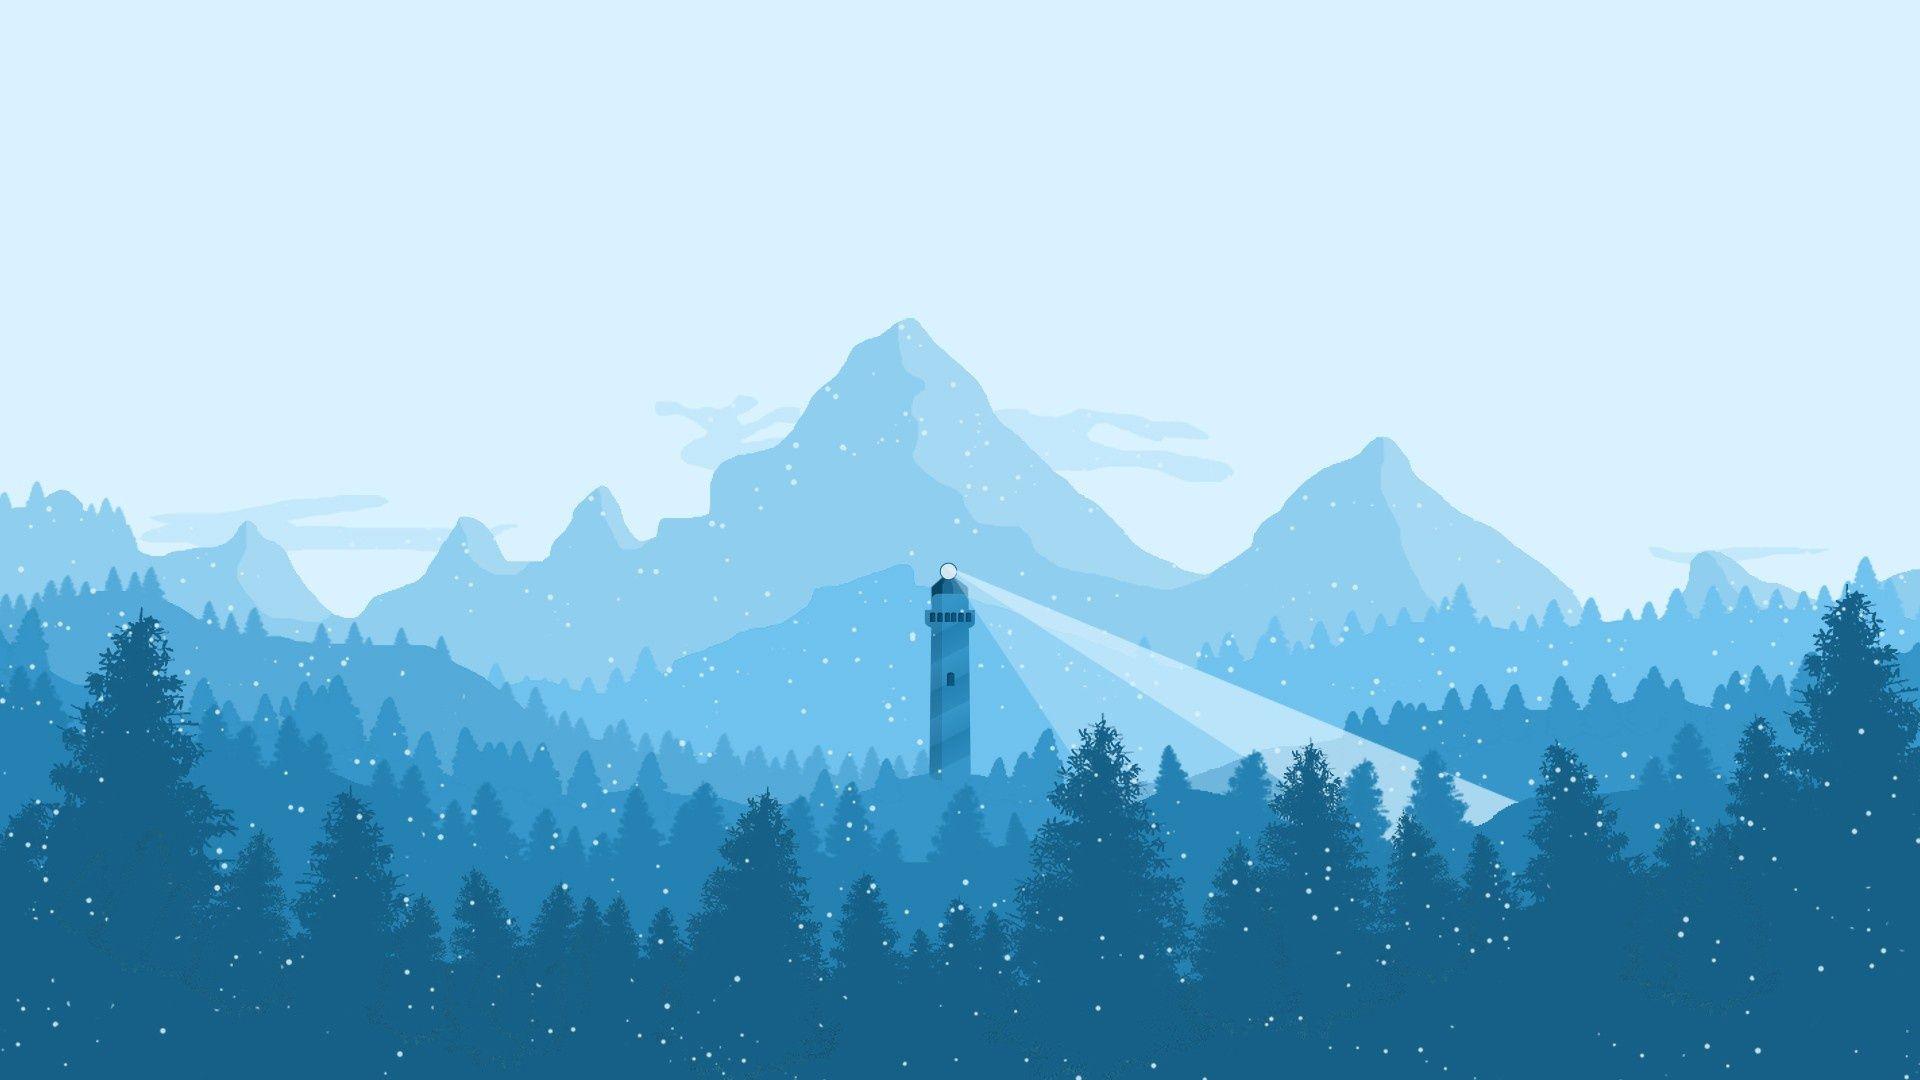 firewatch wallpaper,mountainous landforms,natural landscape,nature,mountain,mountain range